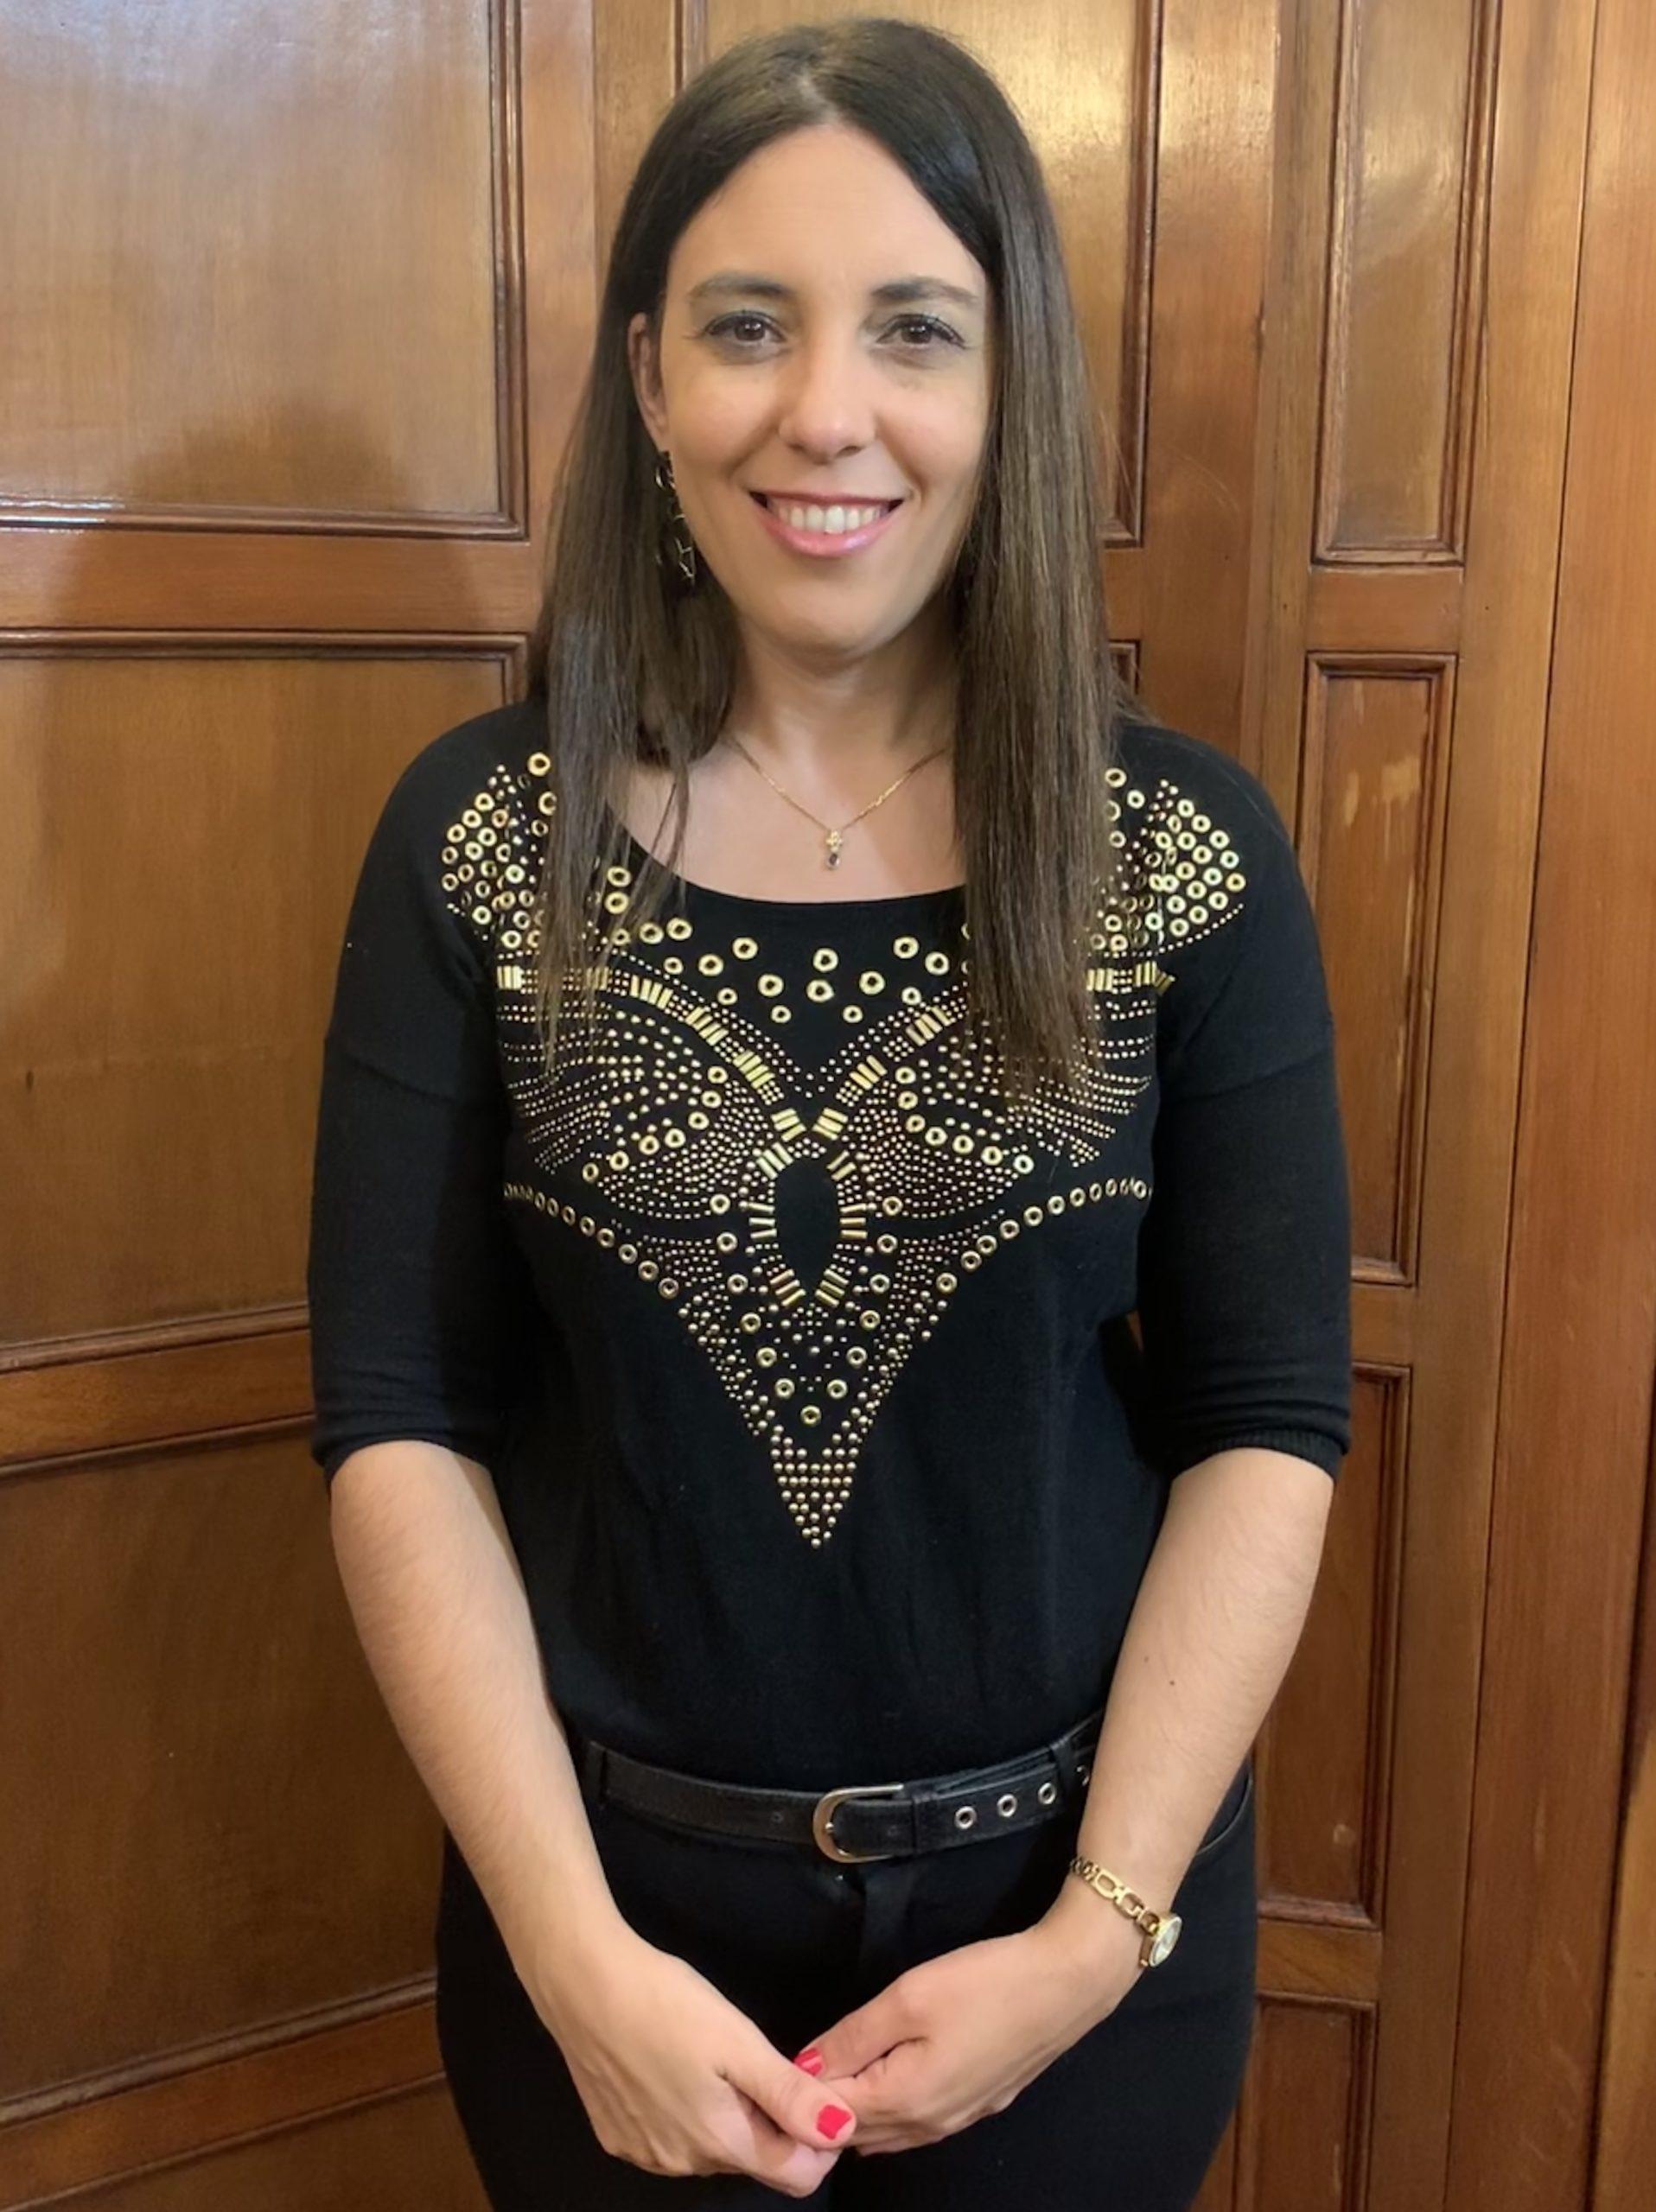 Dra. Paola Albertini